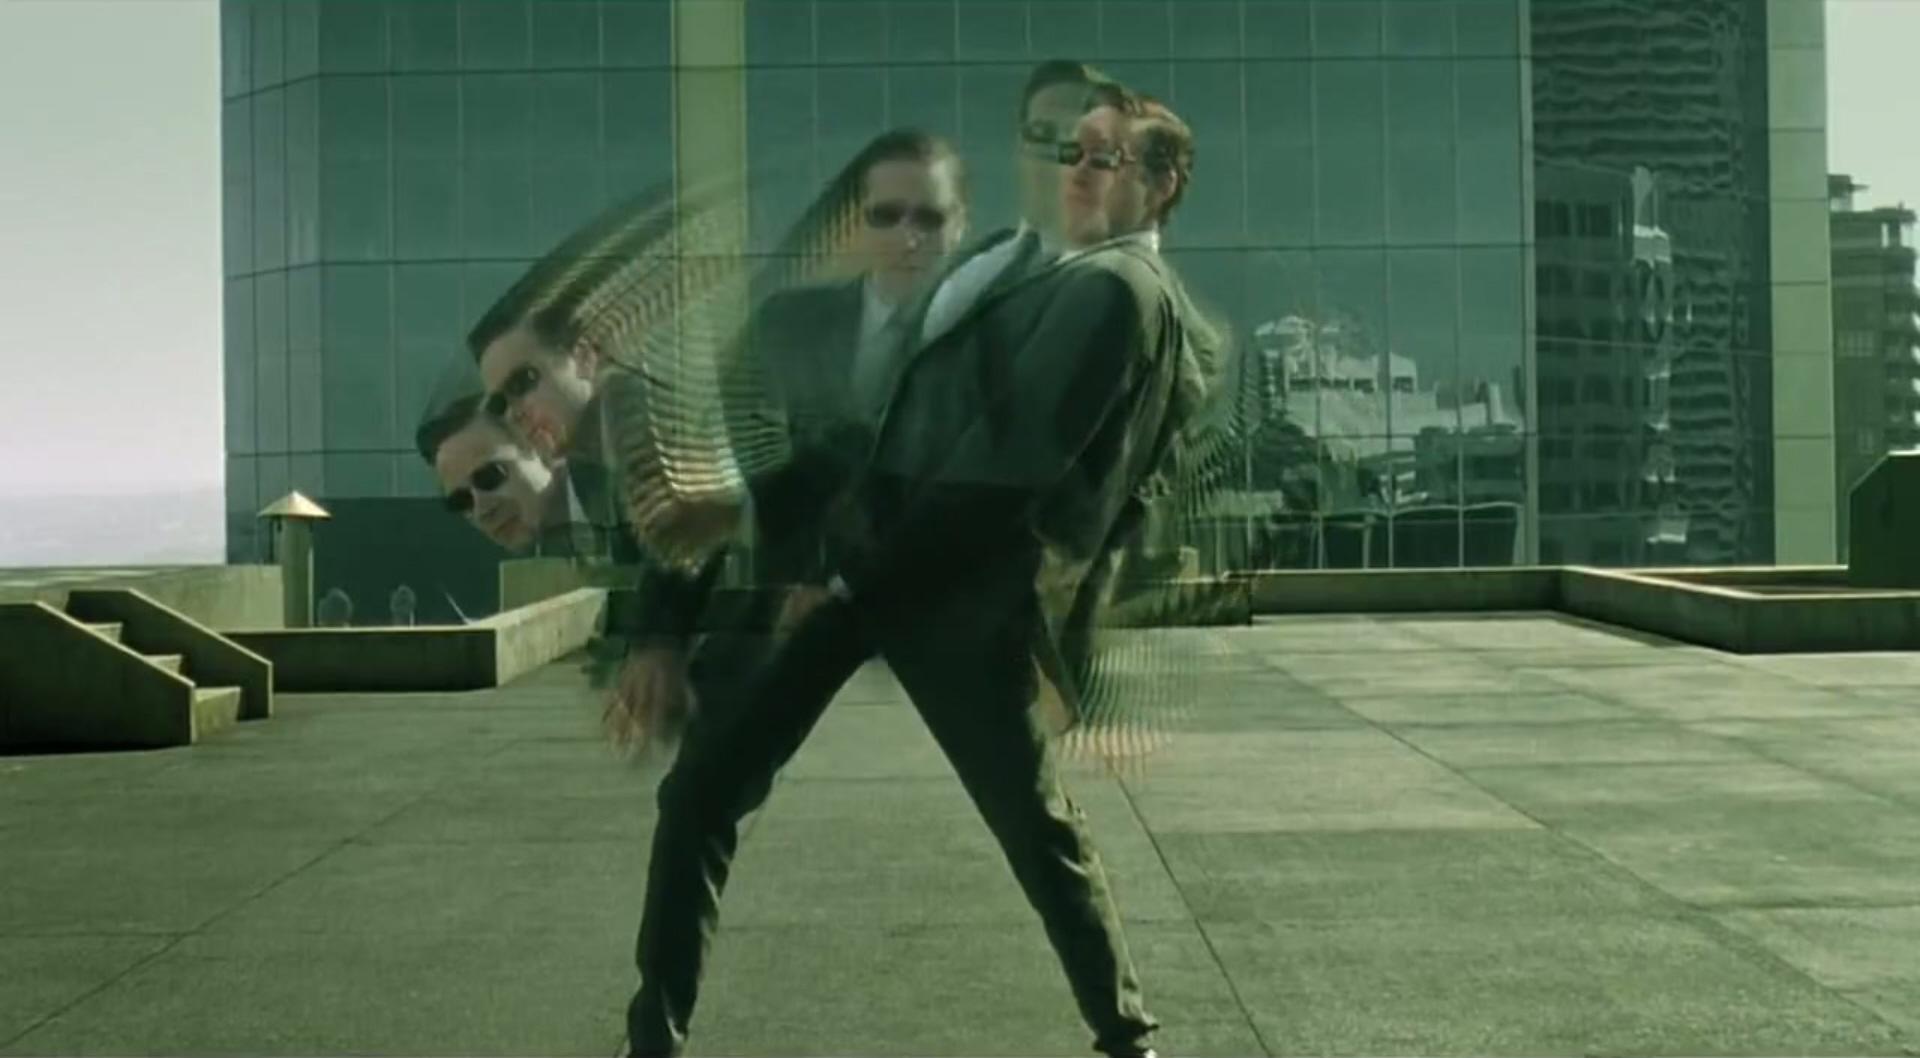 Source: The Matrix